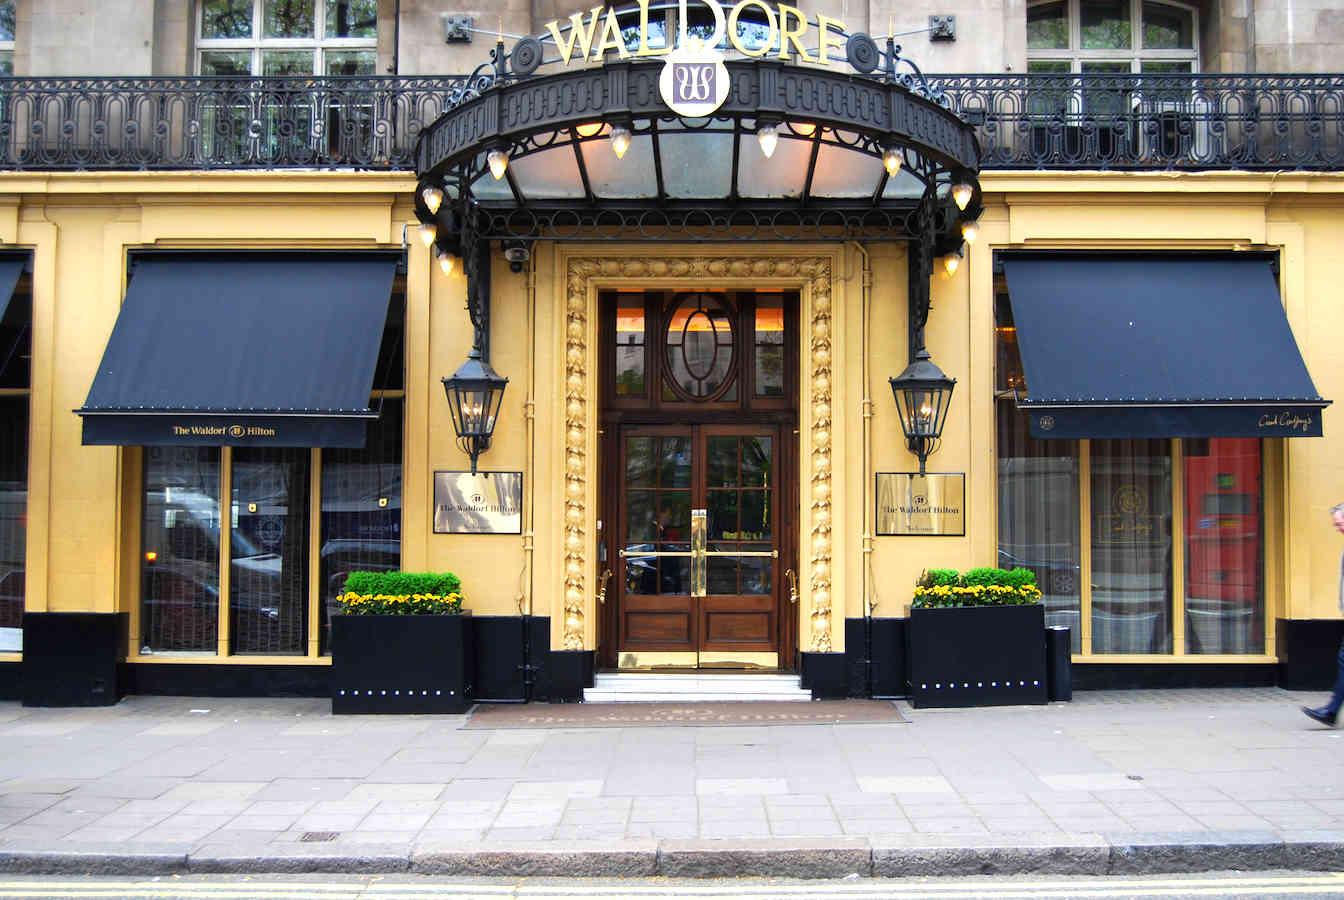 Victorian Awnings London – Waldorf Hotel